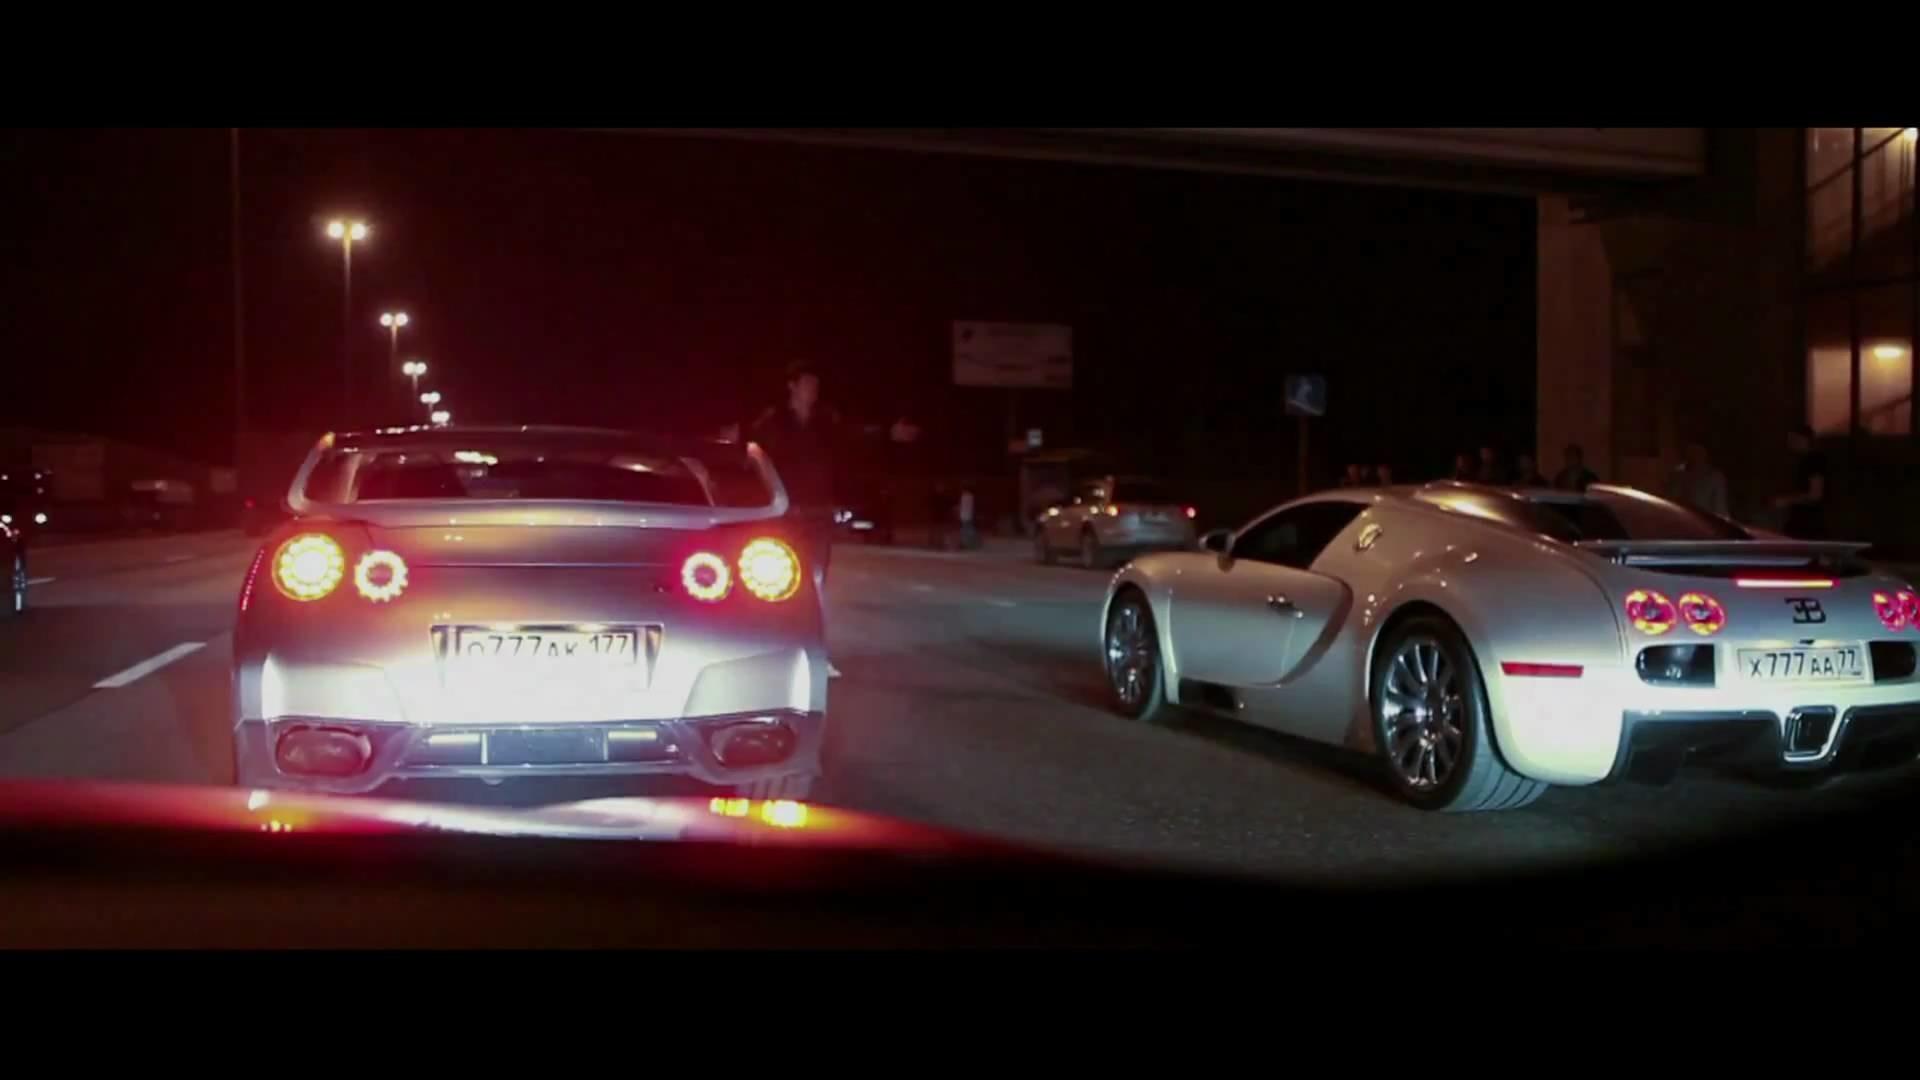 Res: 1920x1080, Crazy Street Racing!!! - YouTube